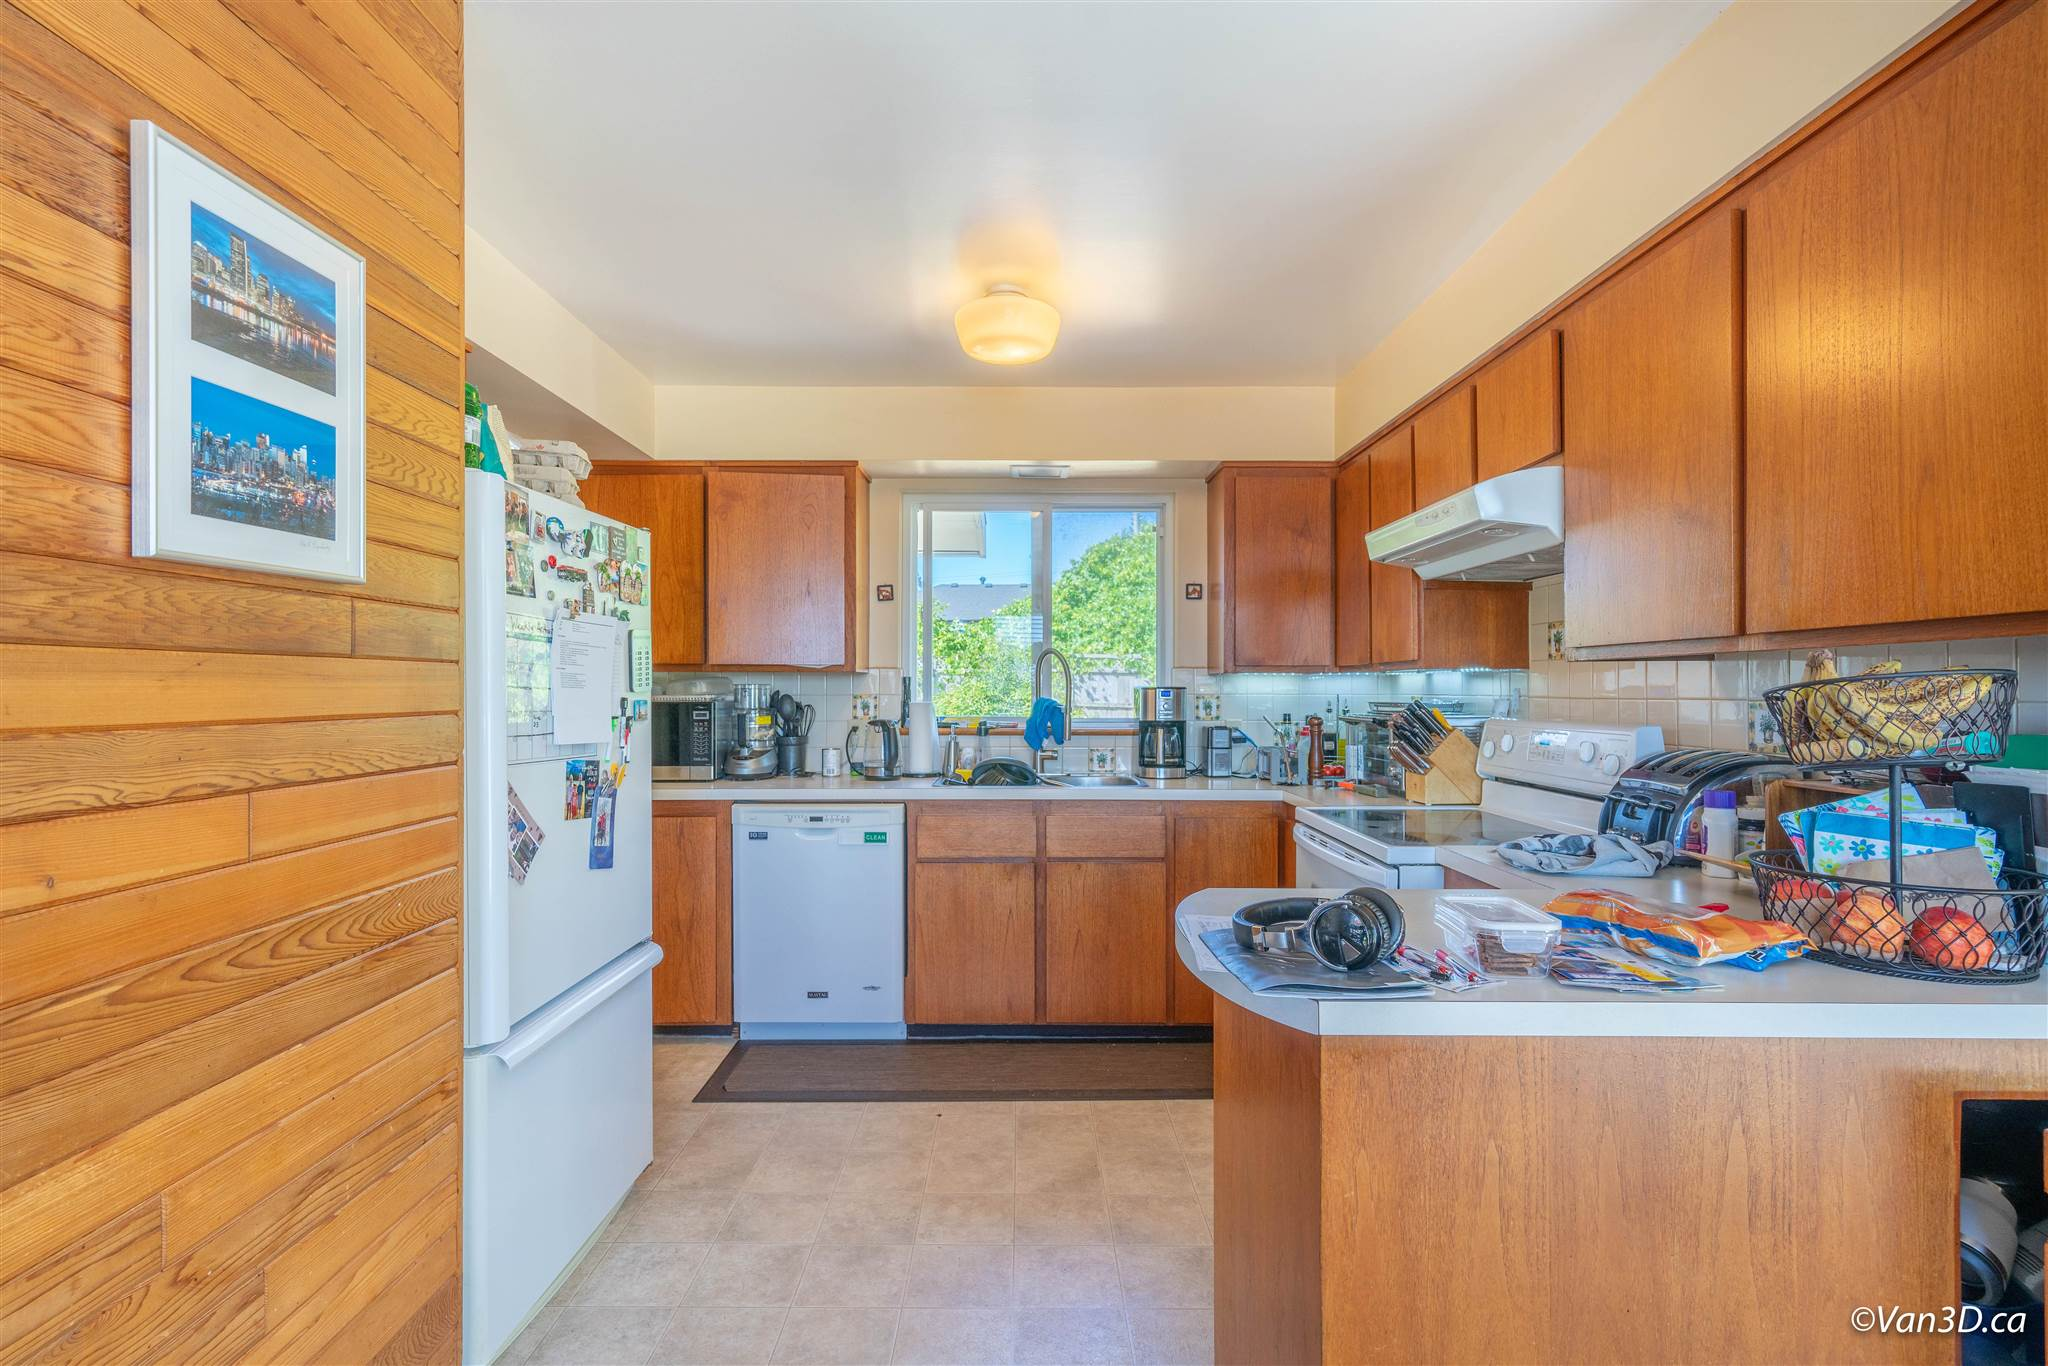 14495 MANN PARK CRESCENT - White Rock House/Single Family for sale, 4 Bedrooms (R2604561) - #29